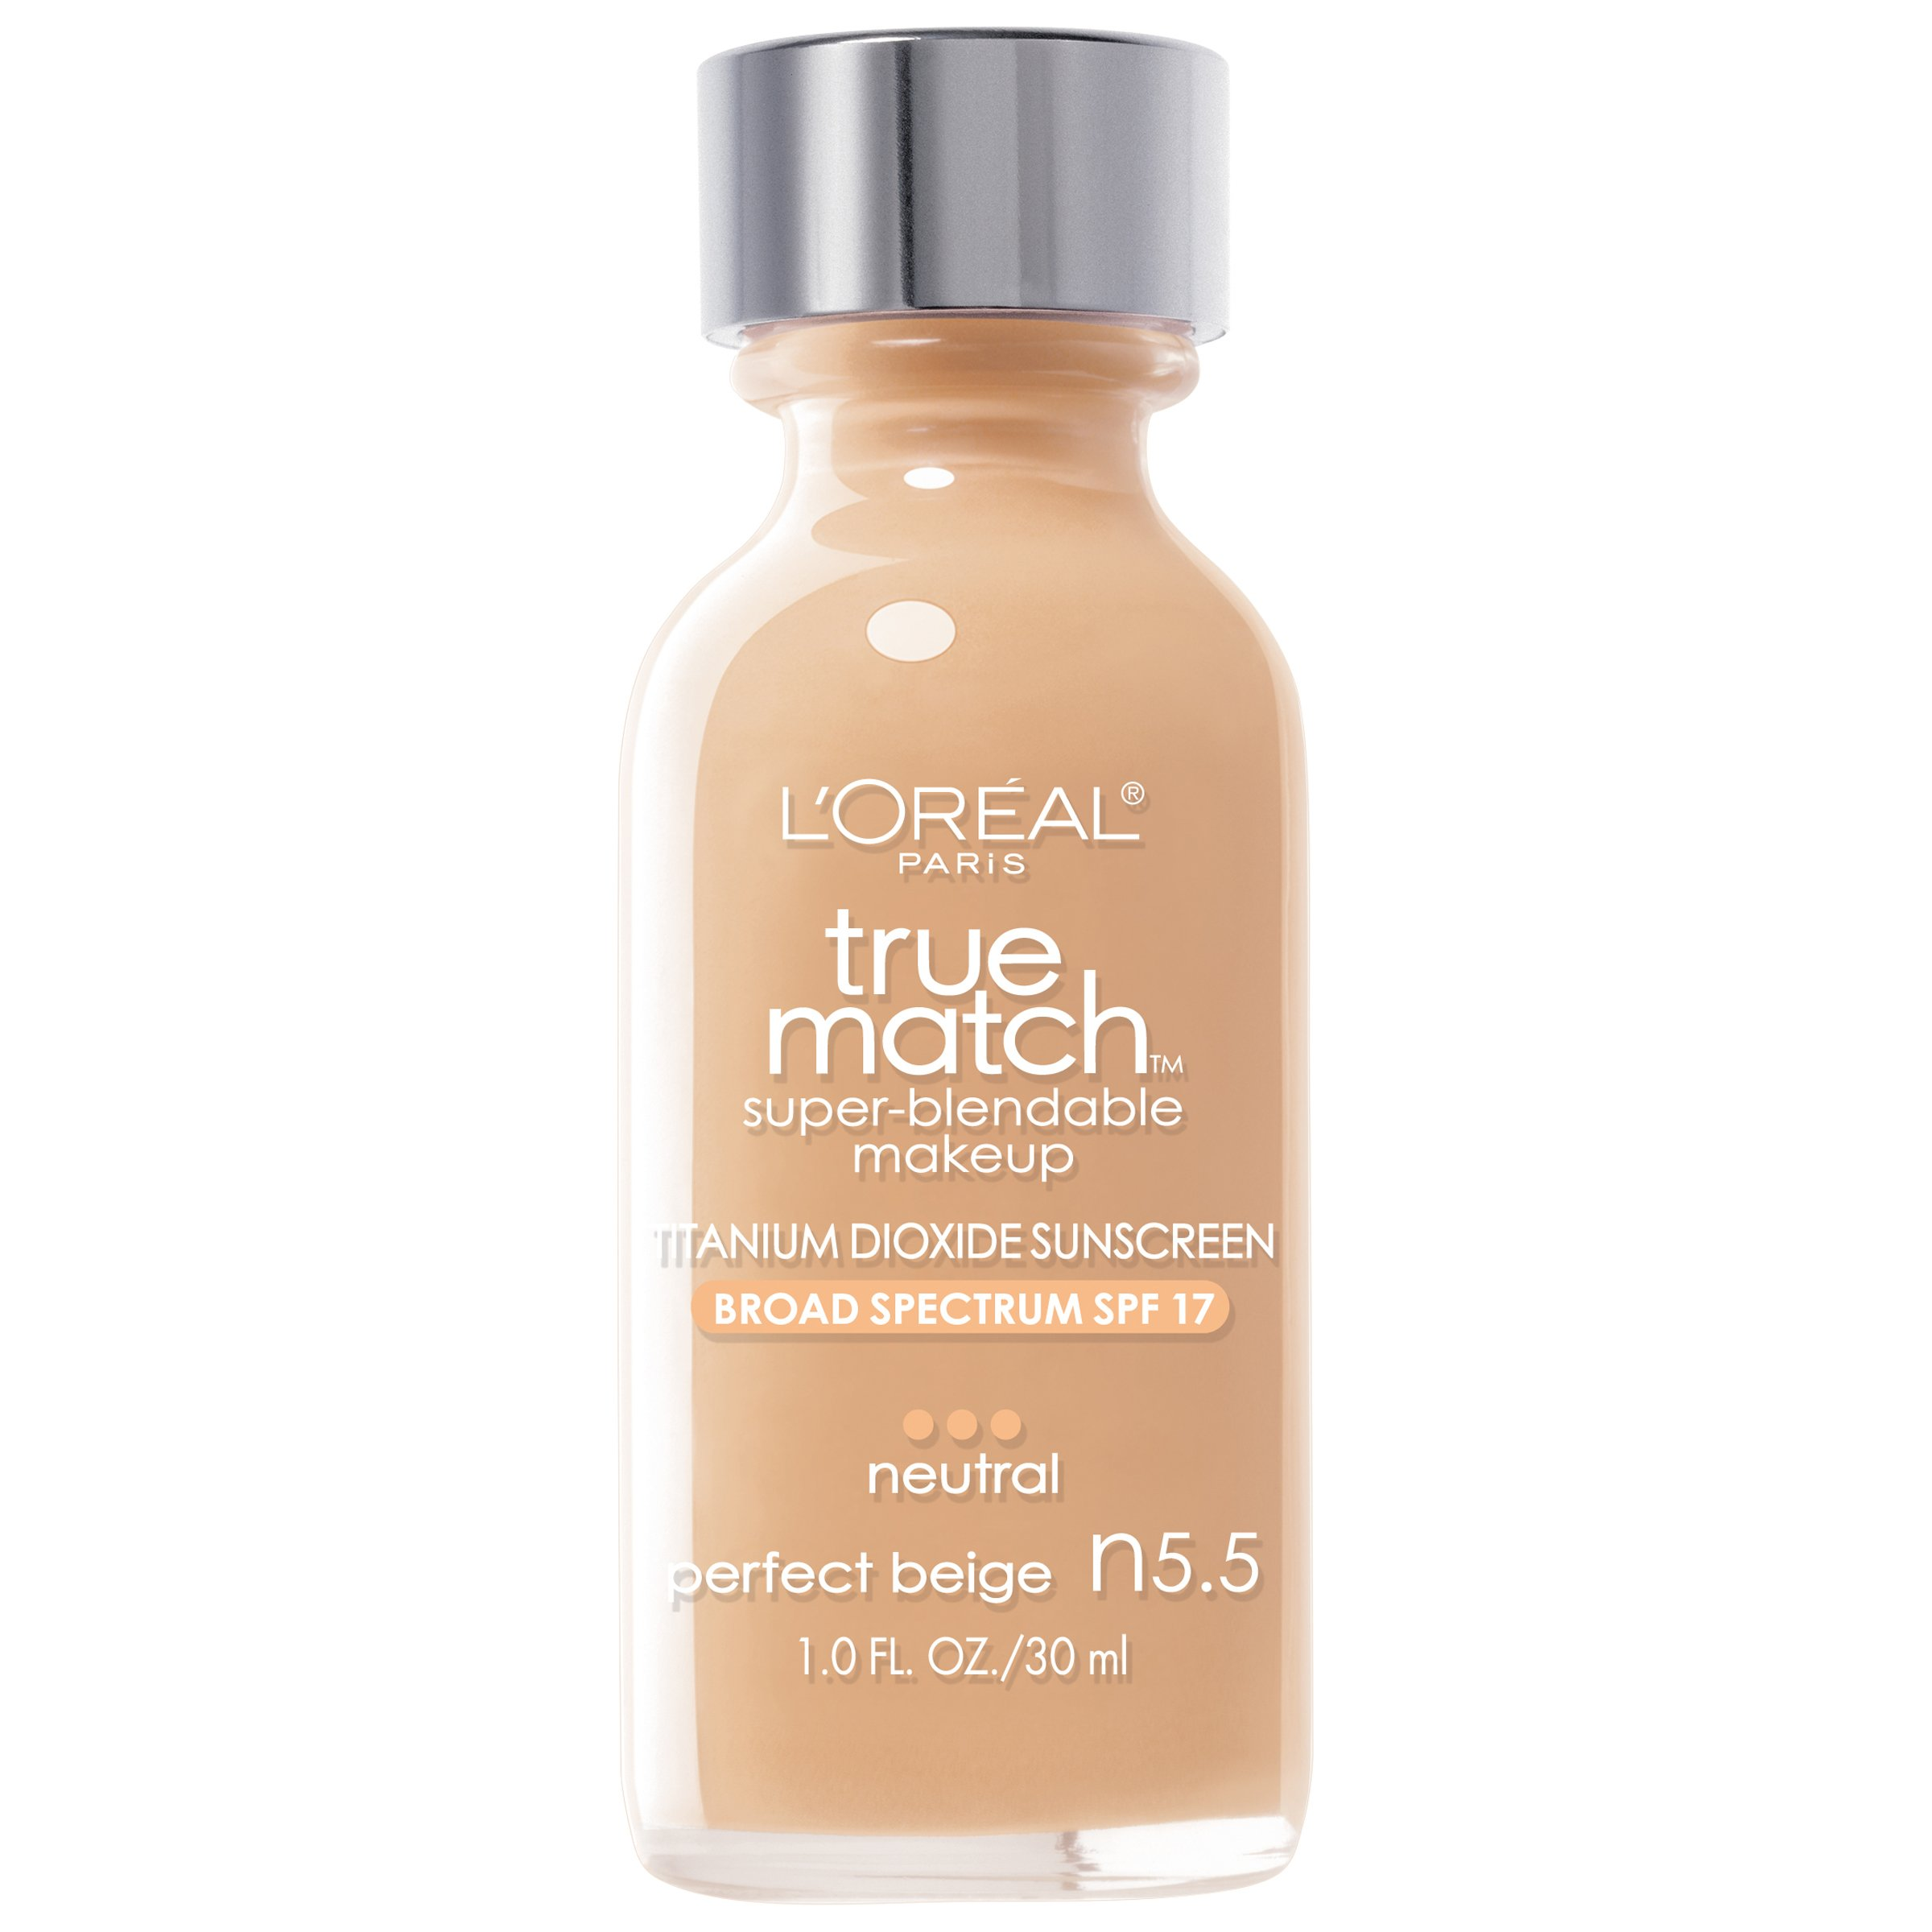 L'Oreal Paris Makeup True Match Super-Blendable Liquid Foundation, Perfect Beige N5.5, 1 Fl Oz,1 Count